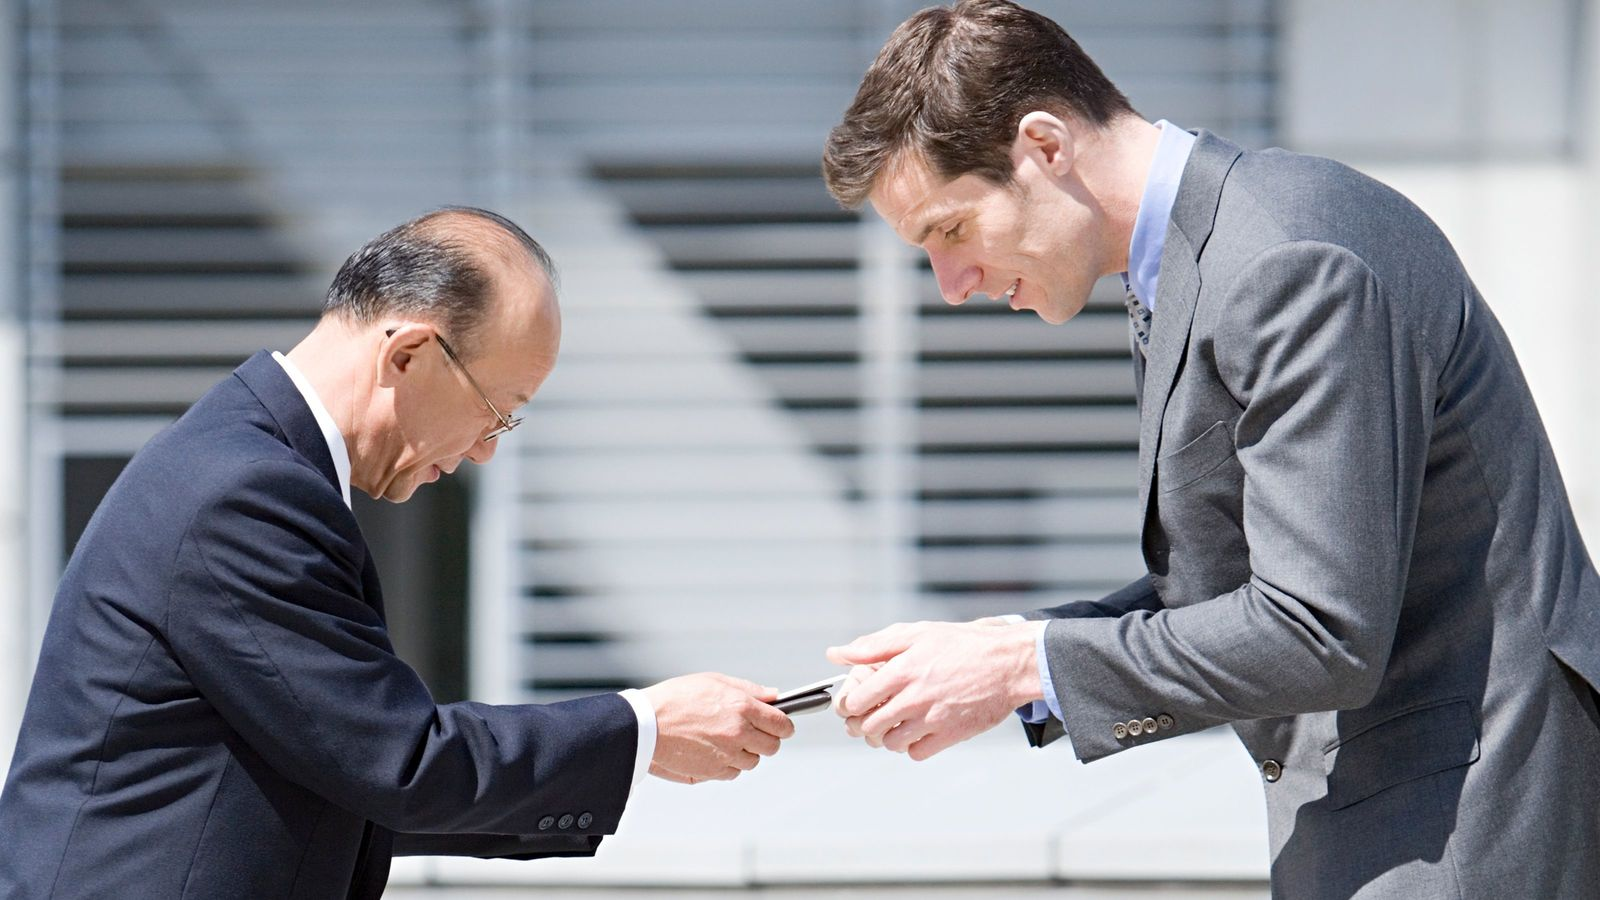 「How do you do?」に堂々とおうむ返しする残念な人々 日本語の「はじめまして」とは違う